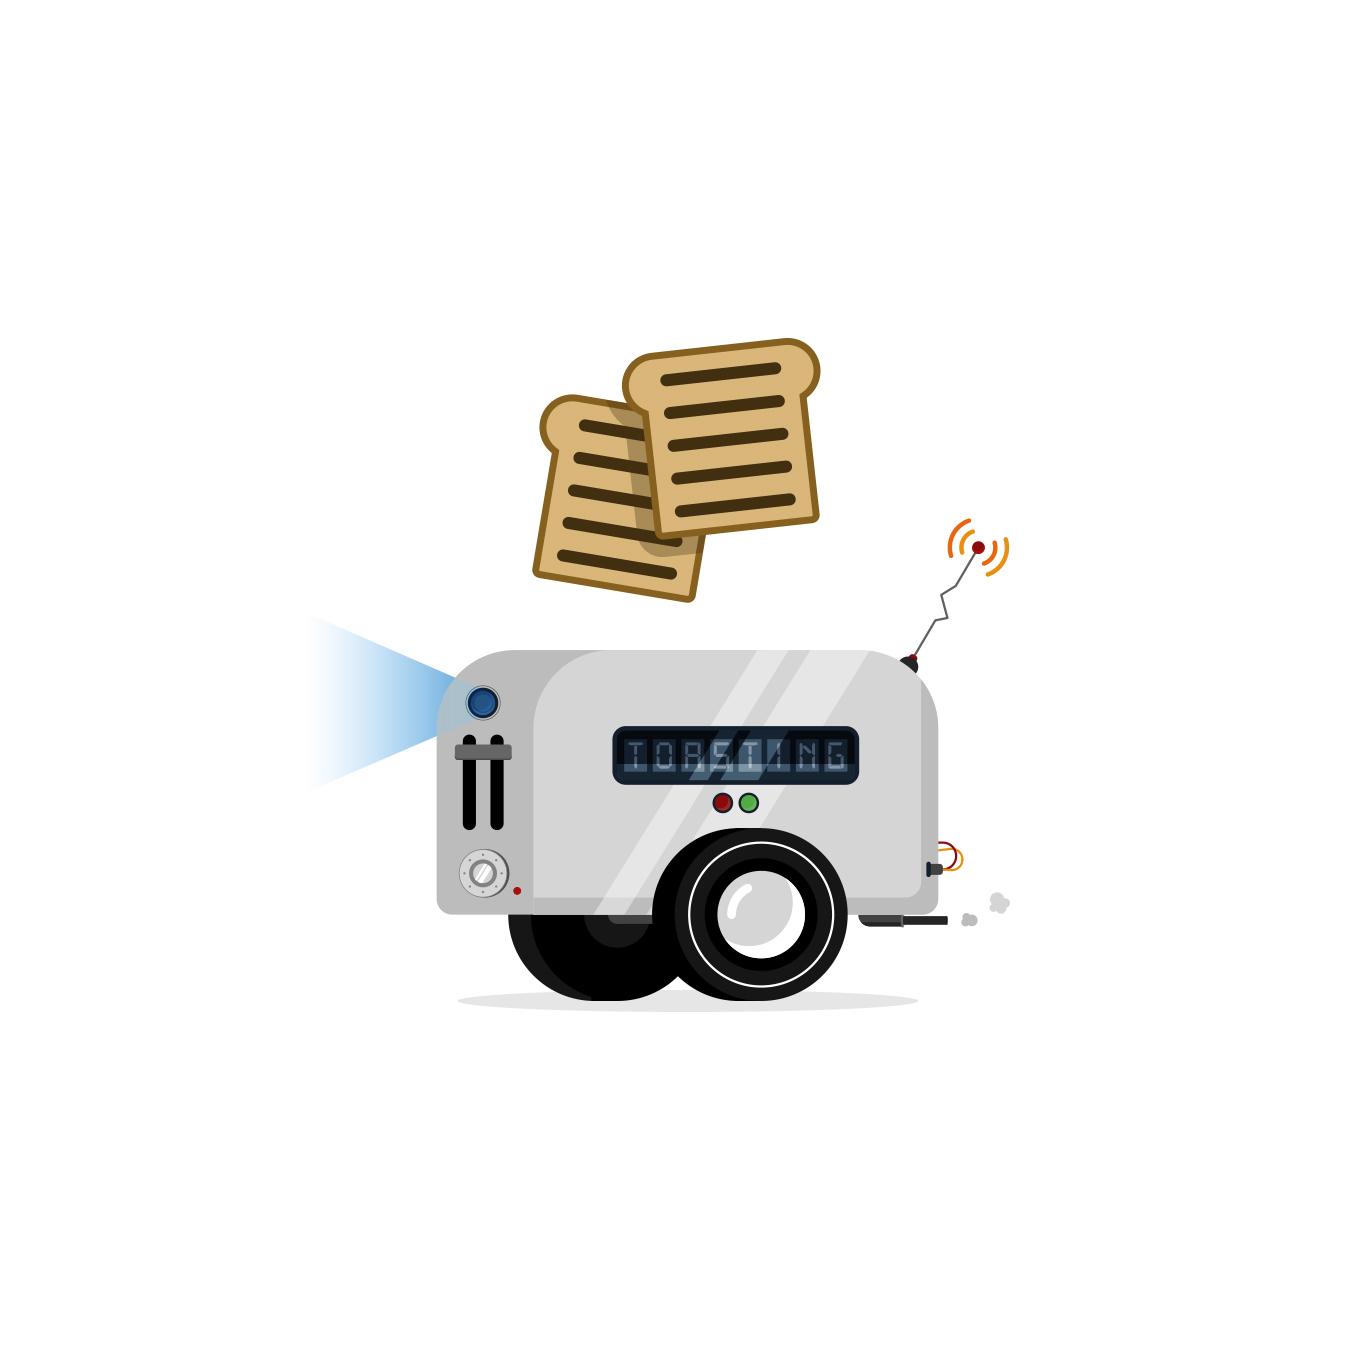 toastbot.jpg